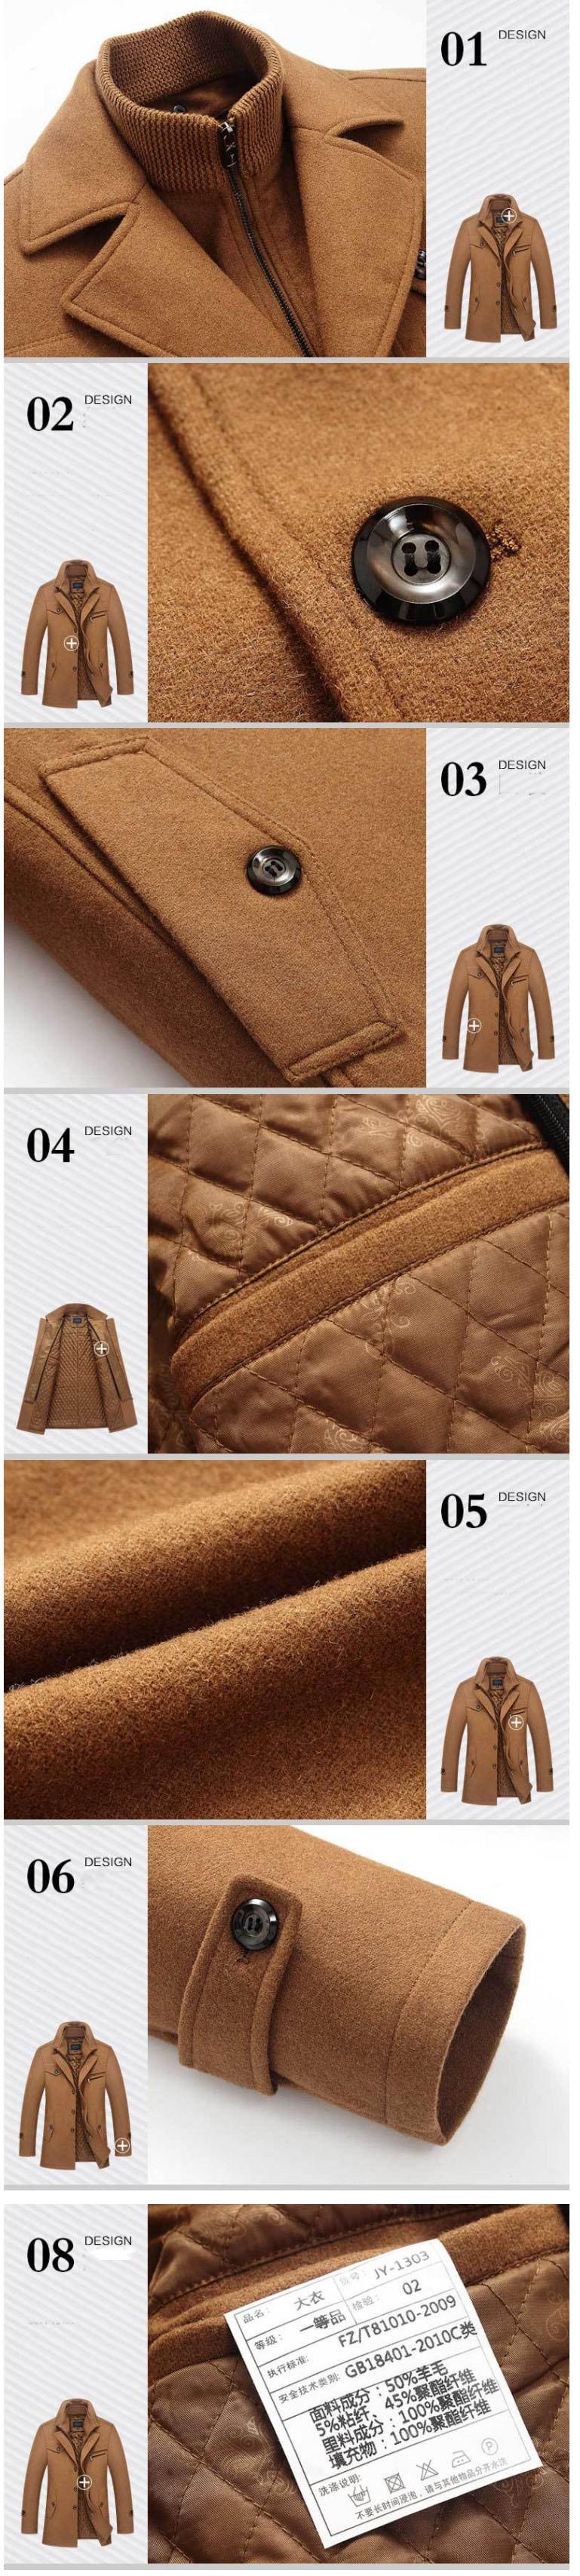 HTB11fbtcyqAXuNjy1Xdq6yYcVXas New Winter Wool Coat Slim Fit Jackets Mens Casual Warm Outerwear Jacket and coat Men Pea Coat Size M-4XL DROP SHIPPING